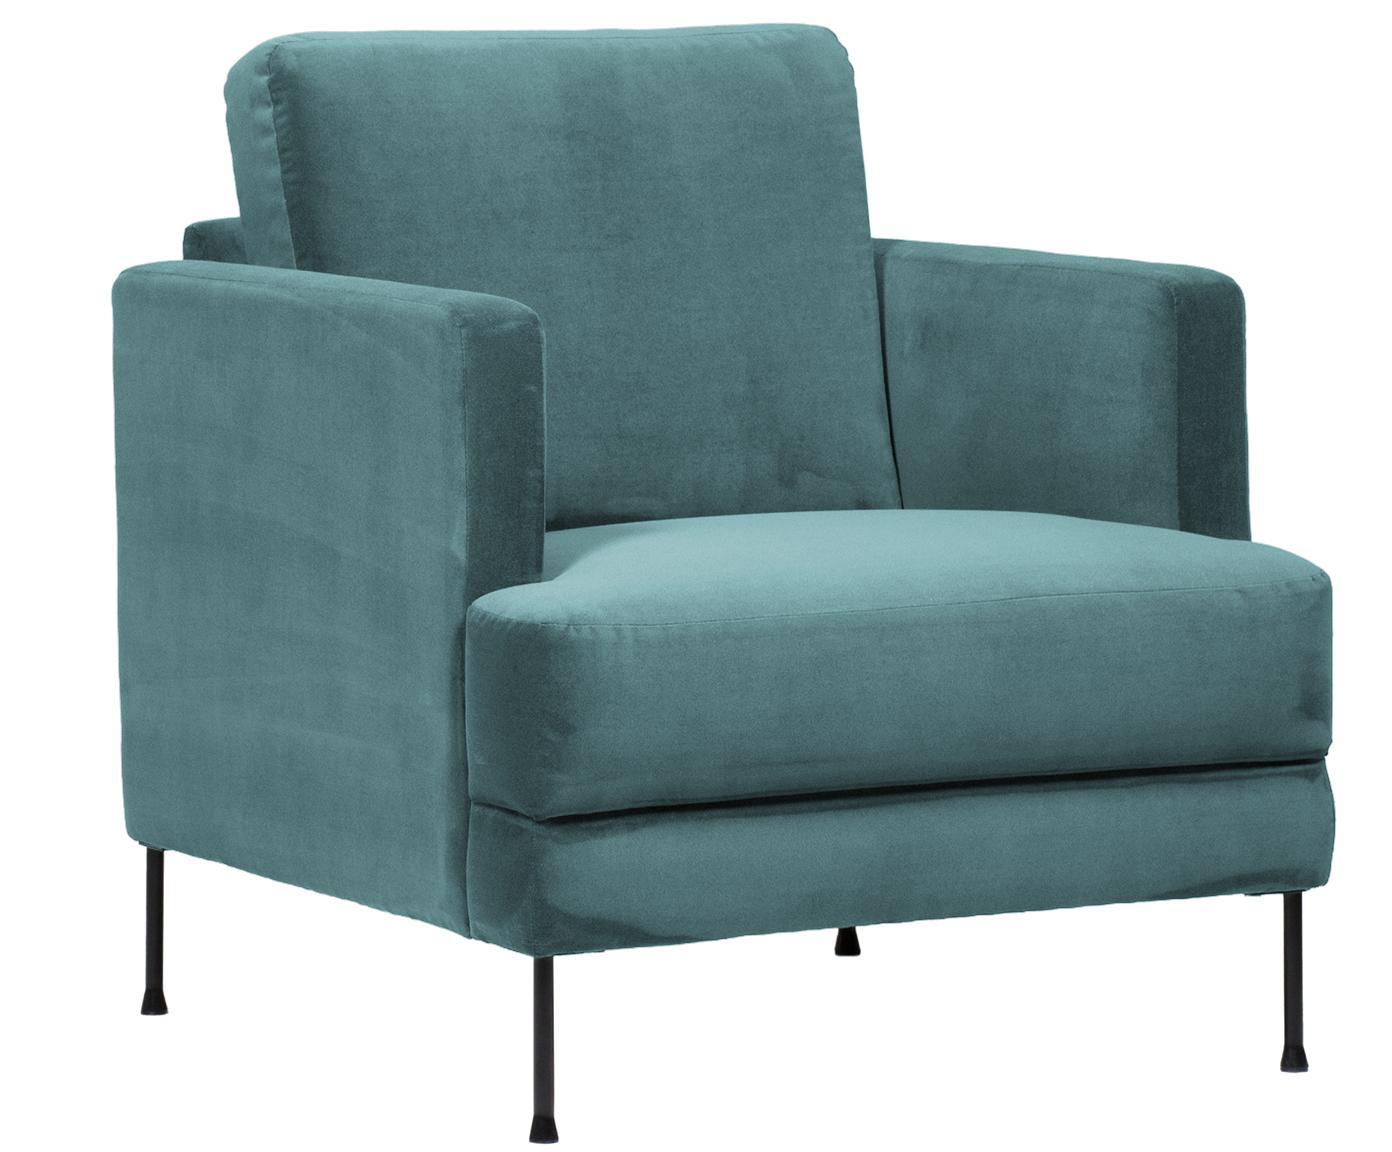 Fluwelen fauteuil Fluente, Bekleding: fluweel (hoogwaardig poly, Frame: massief grenenhout, Poten: gelakt metaal, Turquoise, B 76 x D 83 cm